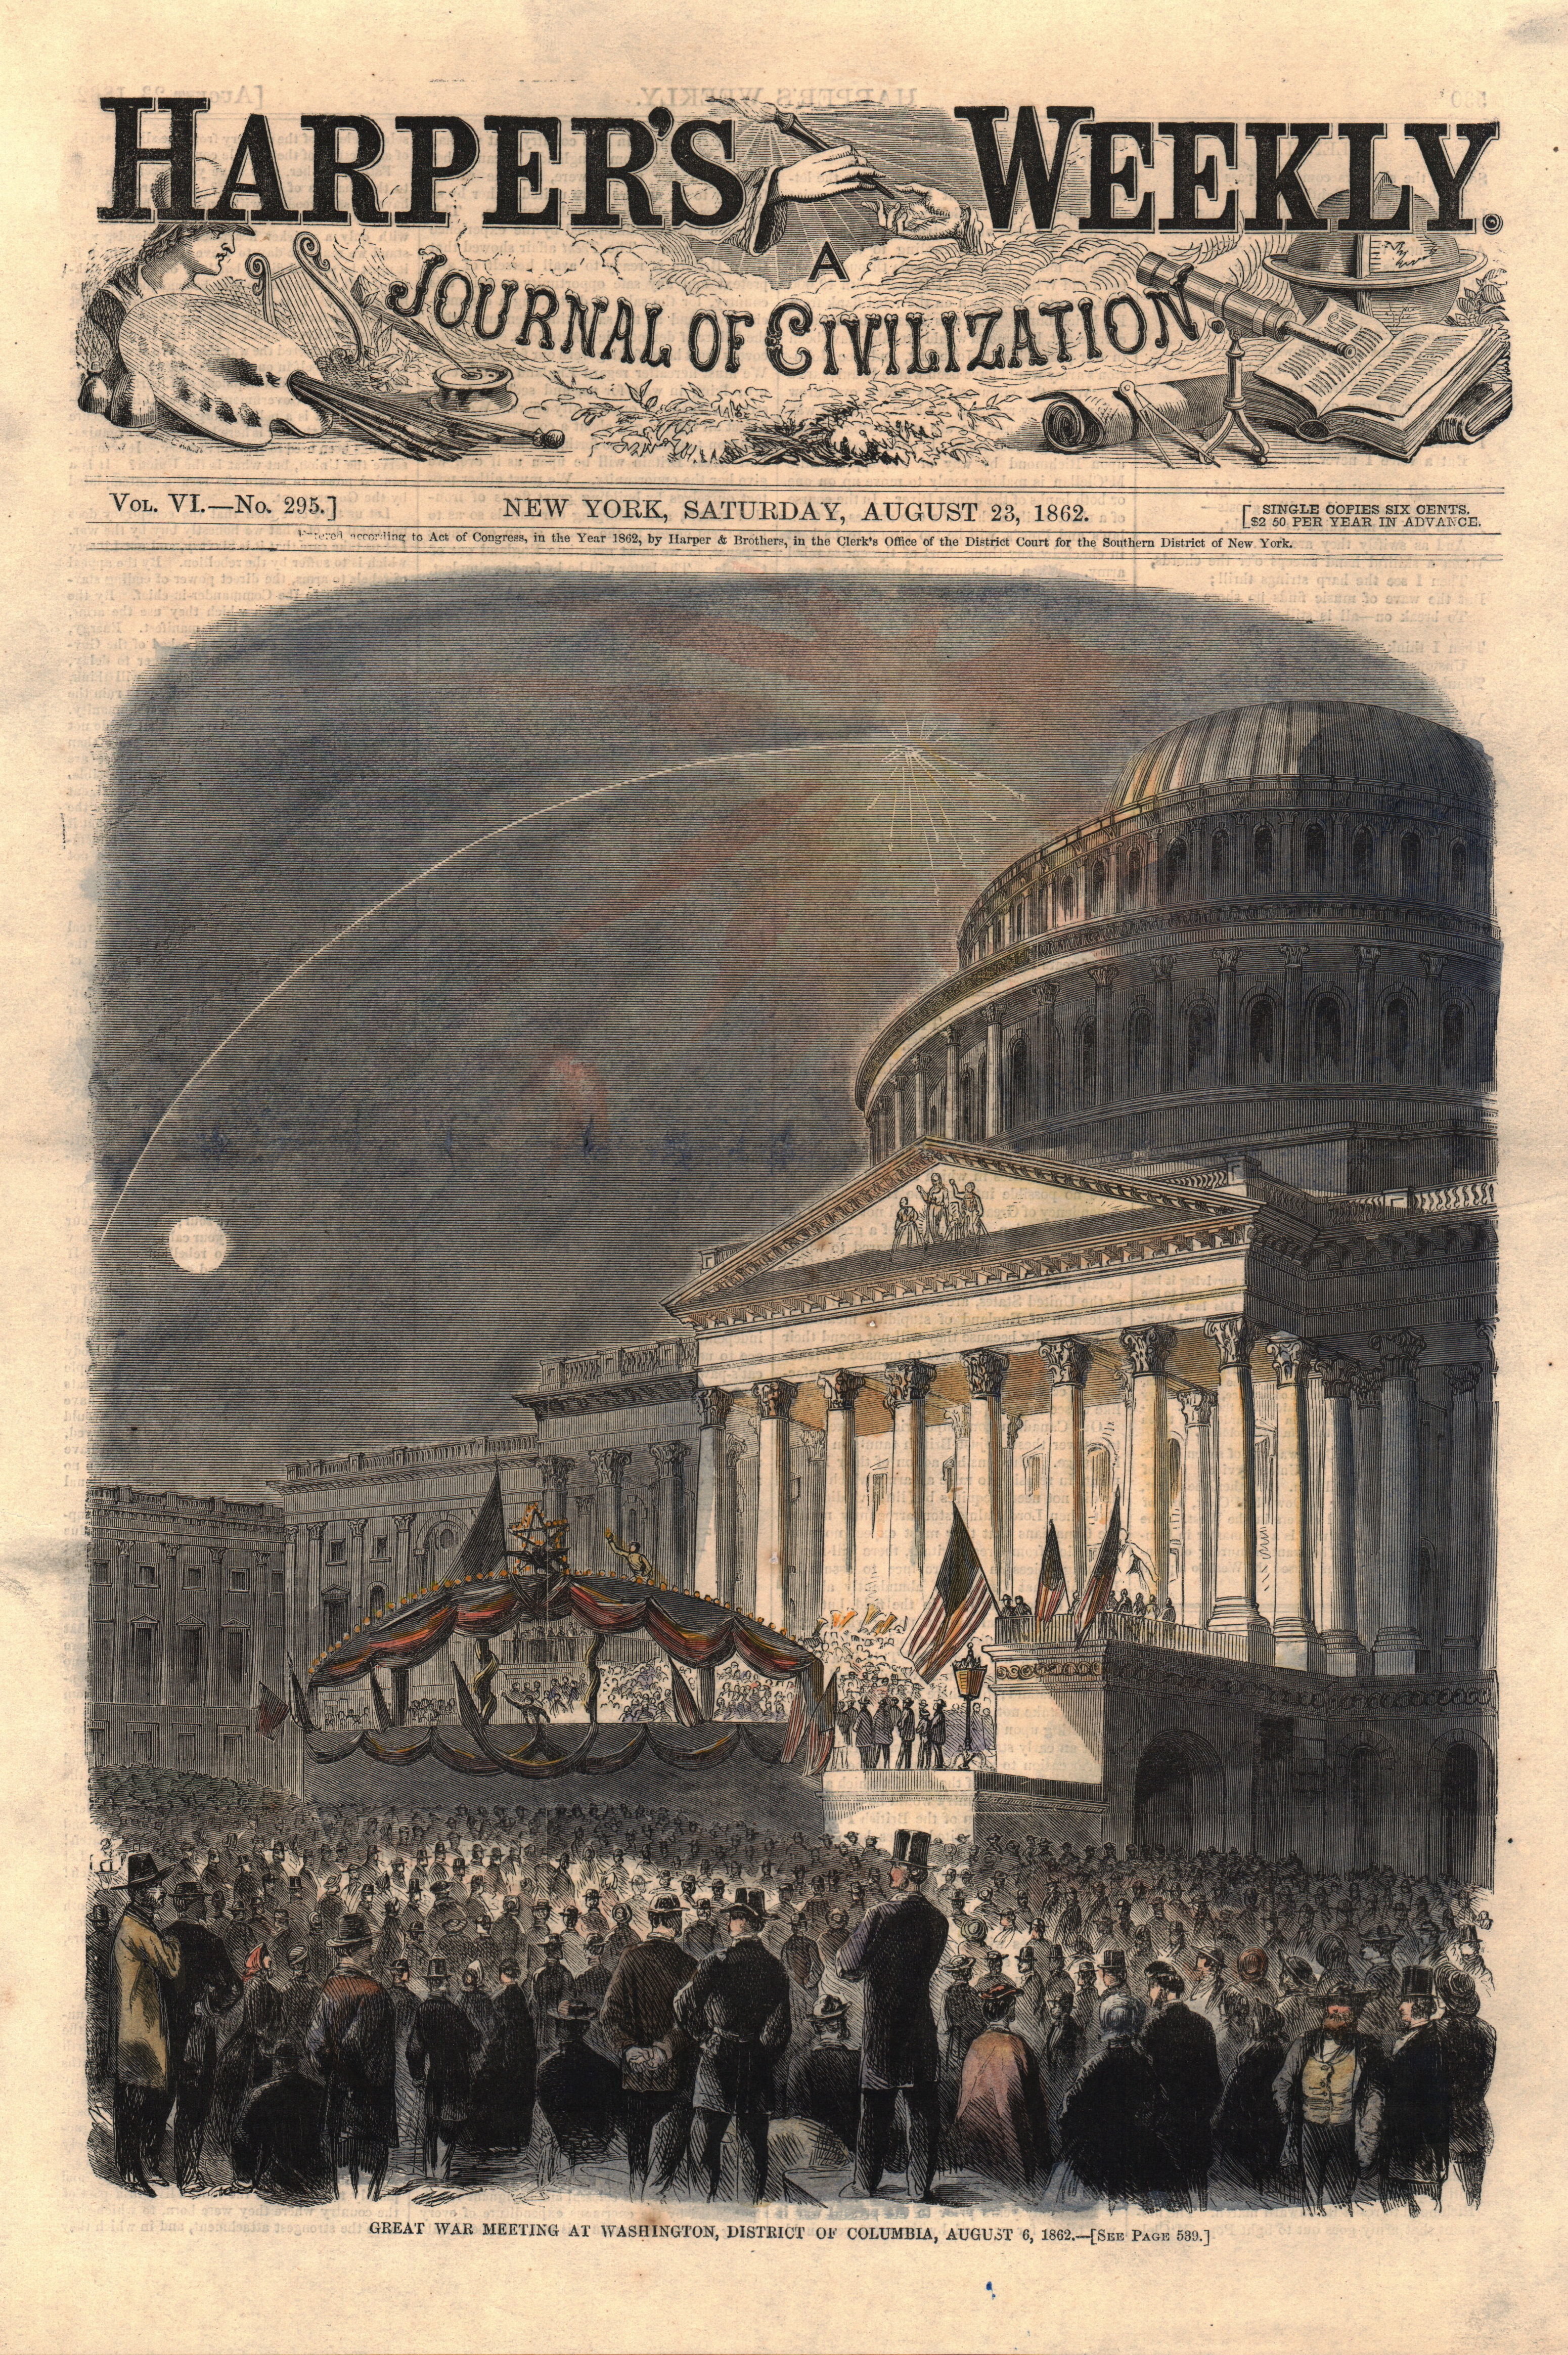 Great War Meeting at Washington